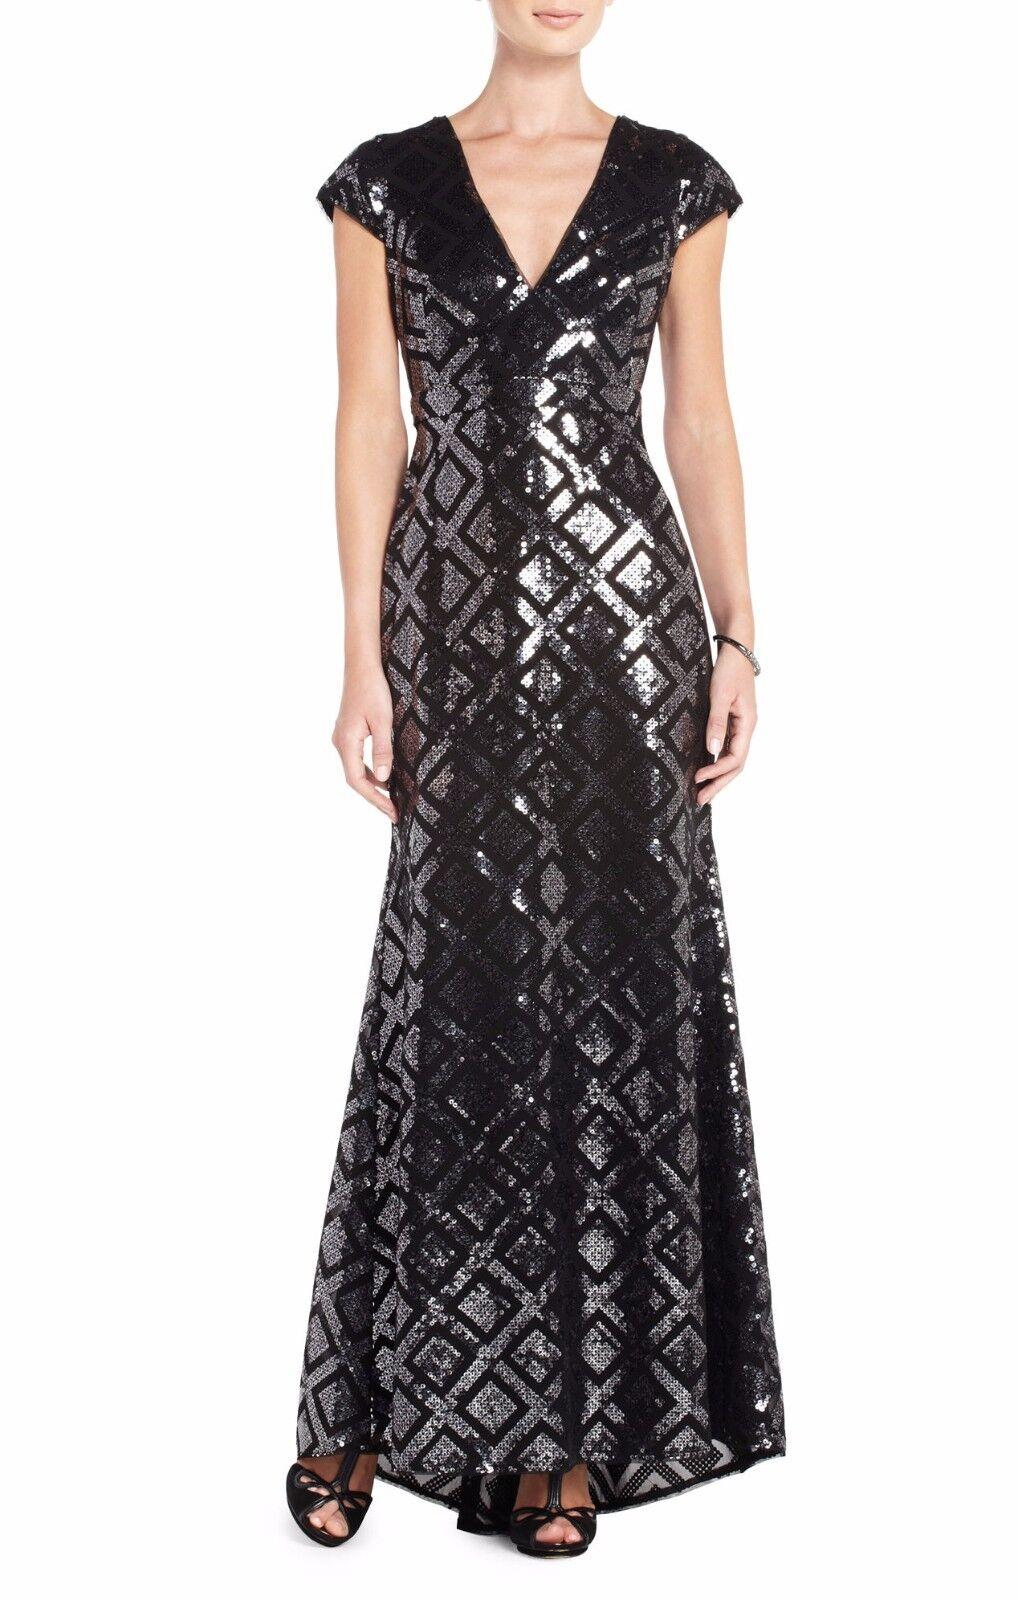 BCBG Max Azria Black Combo Skylah Sequined Evening Gown Wjb6u817 ...